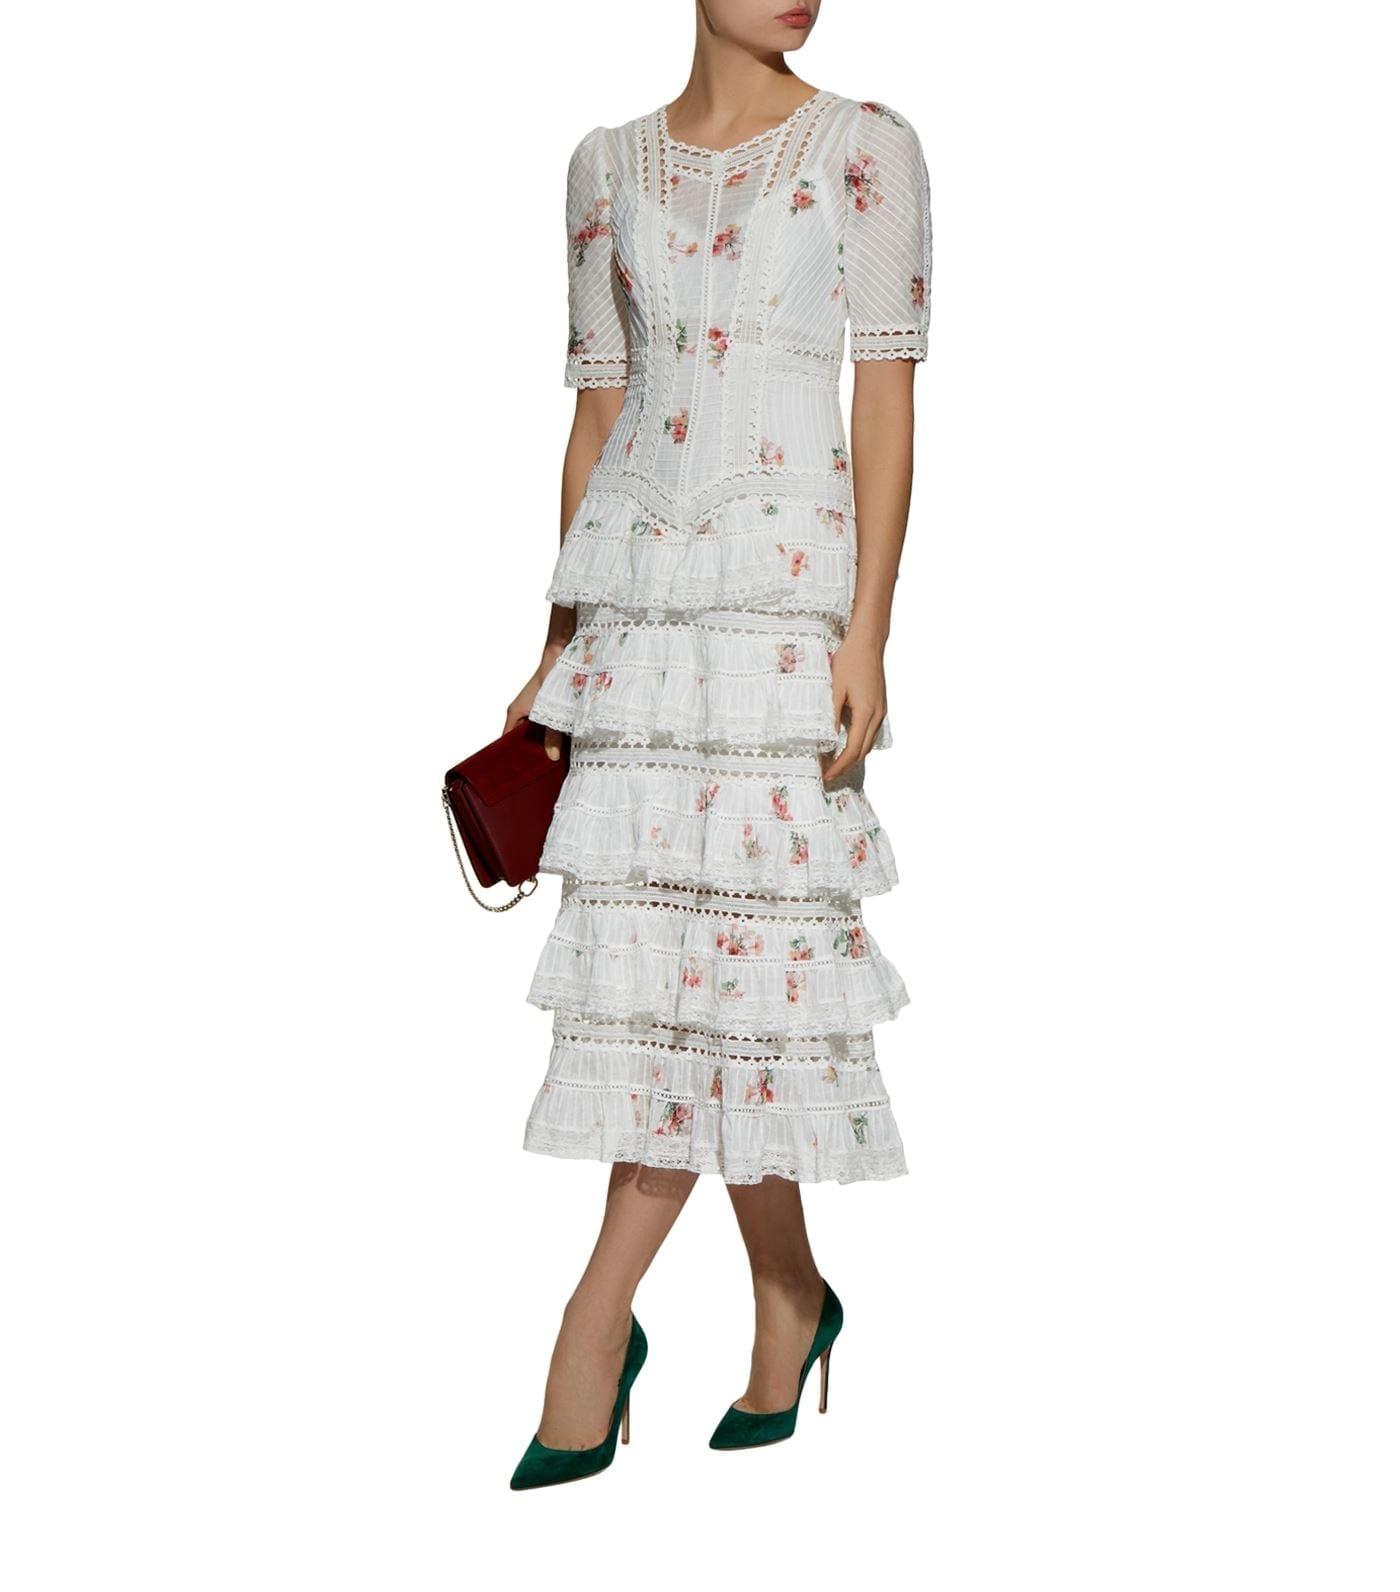 ZIMMERMANN Heathers Tiered Ruffle Midi White / Floral Printed Dress